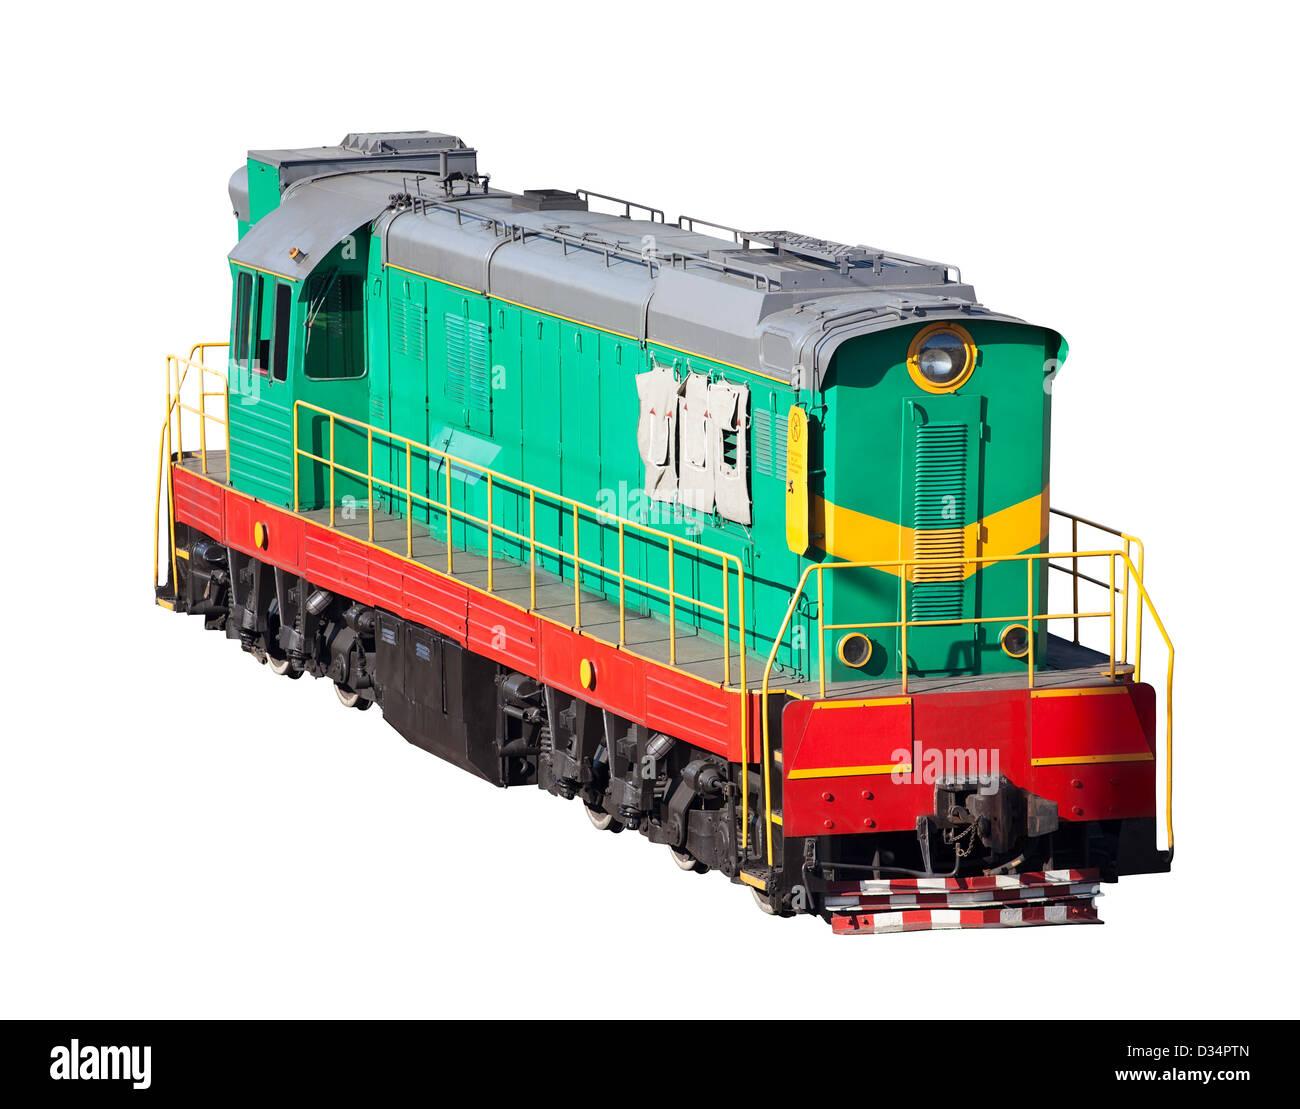 locomotive industrial on white background - Stock Image